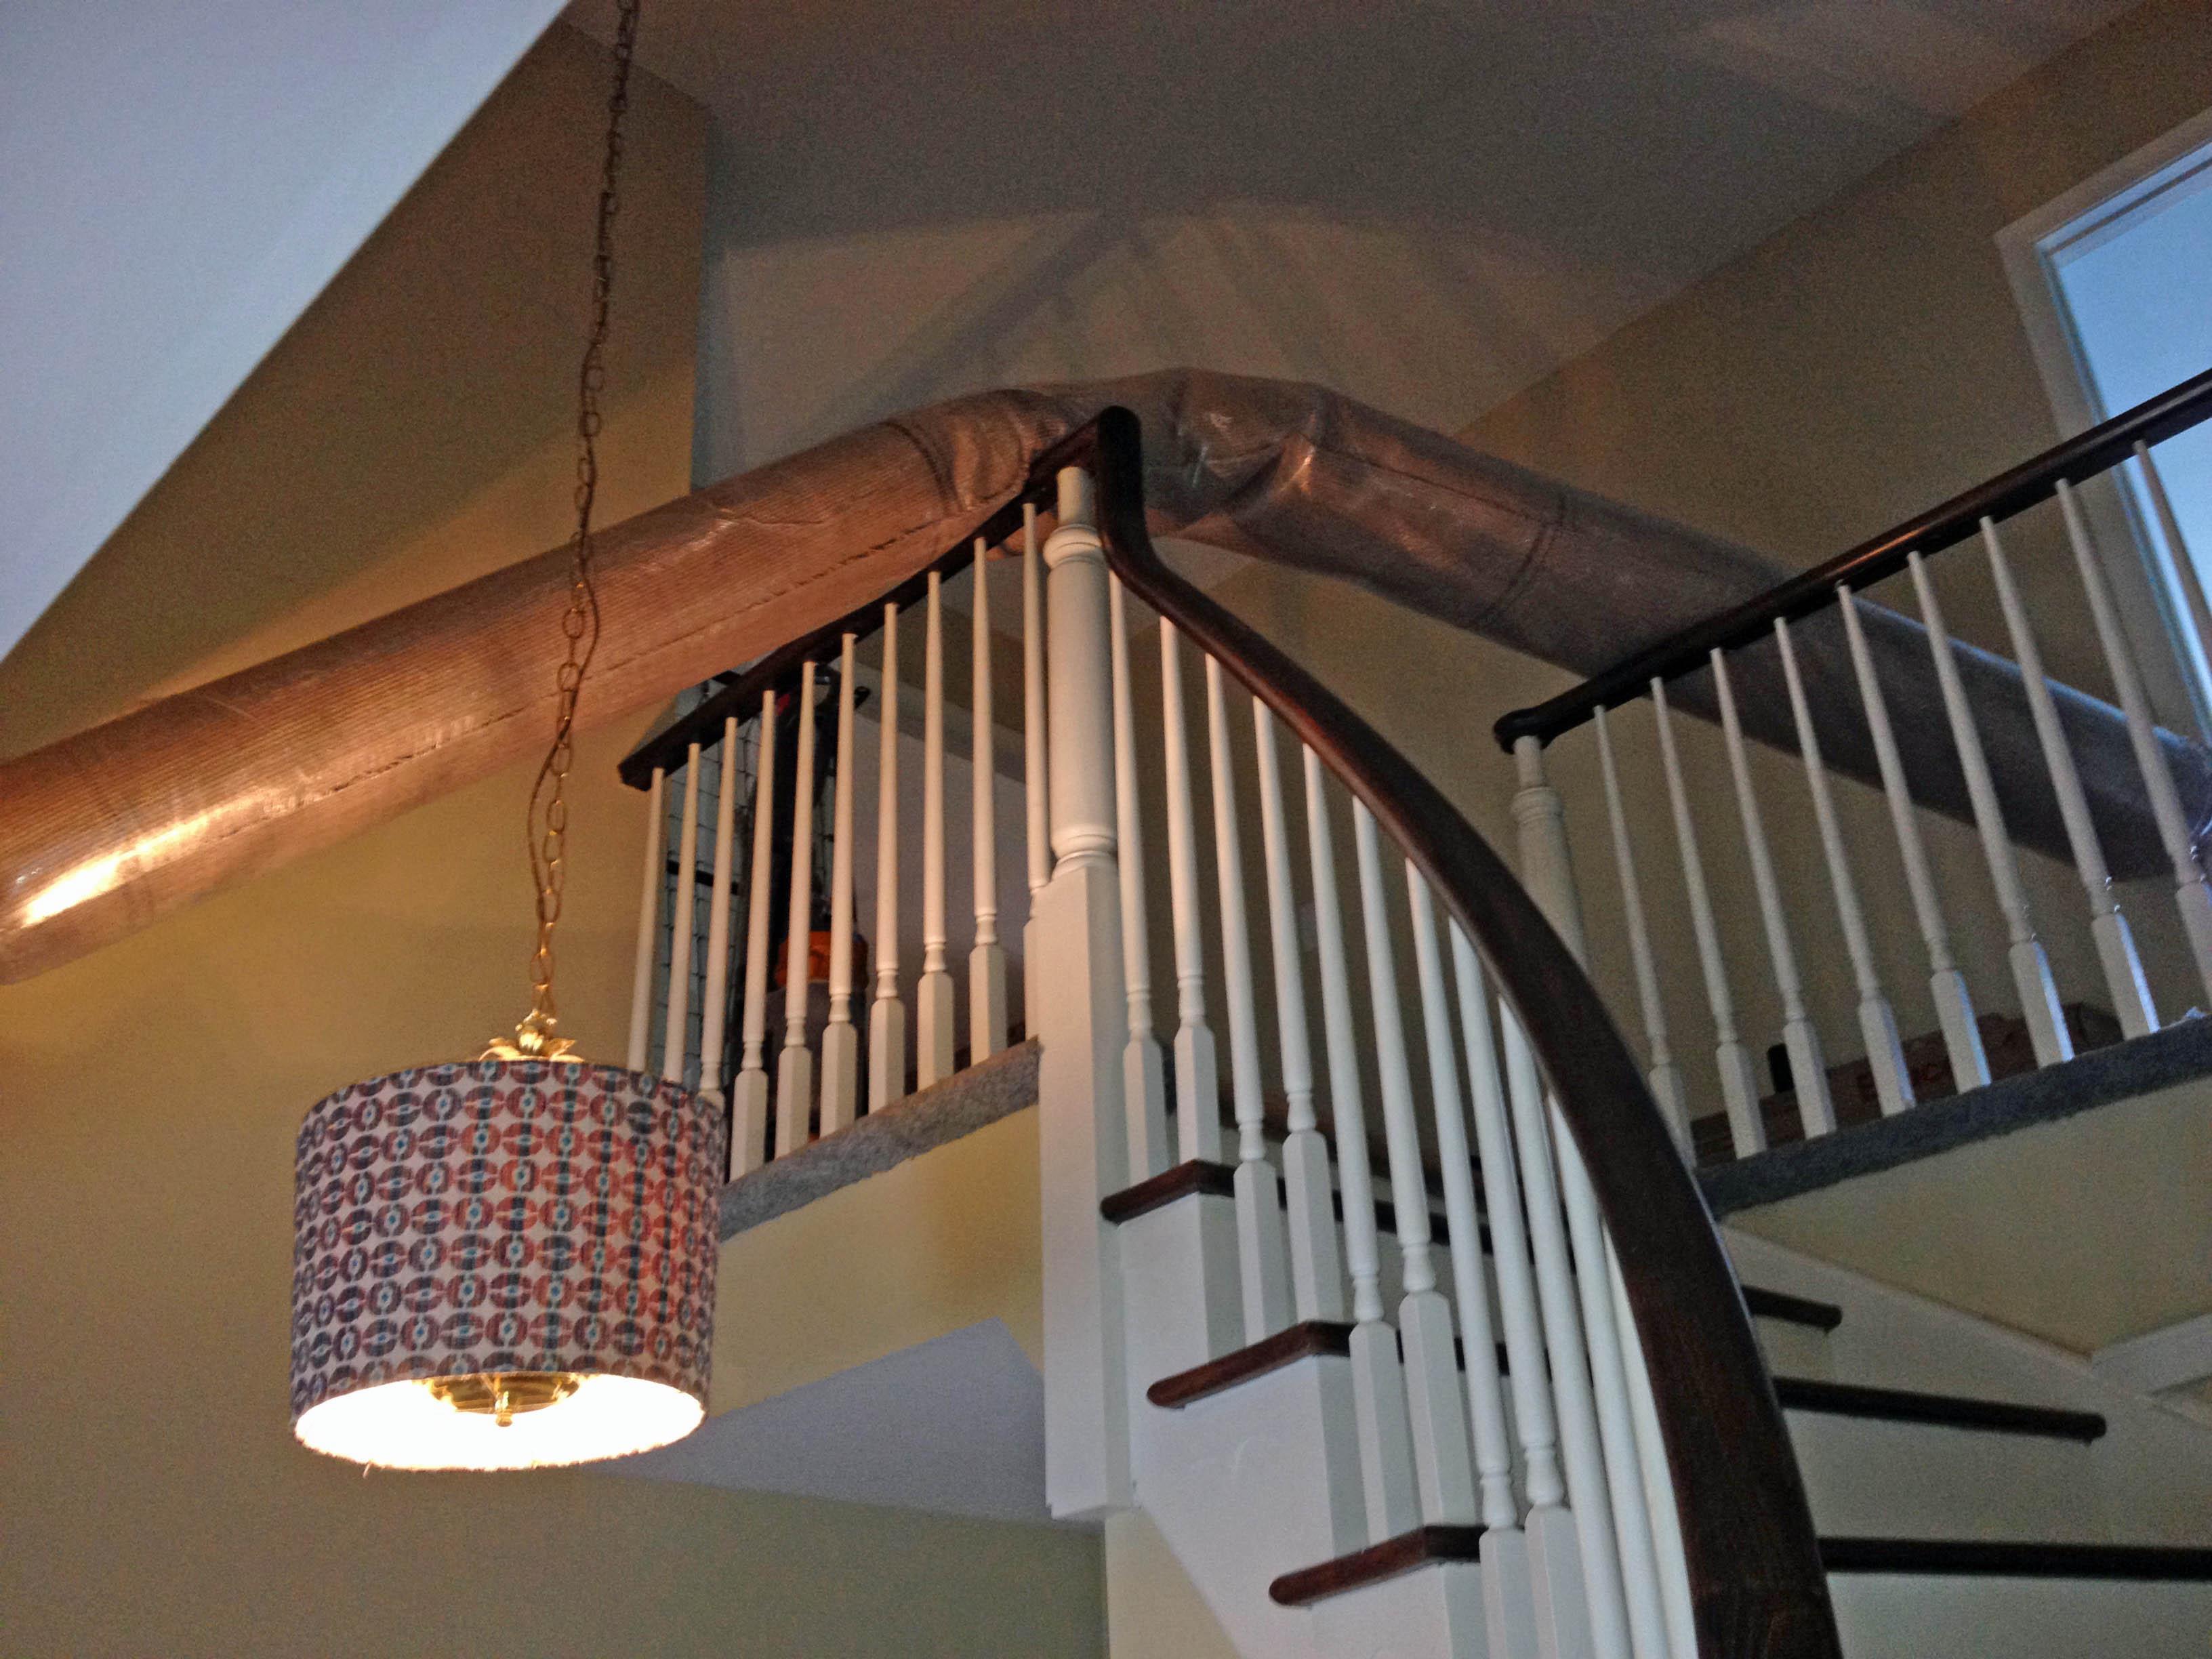 Carpet Seam Repair Images Roller Home Depot Best